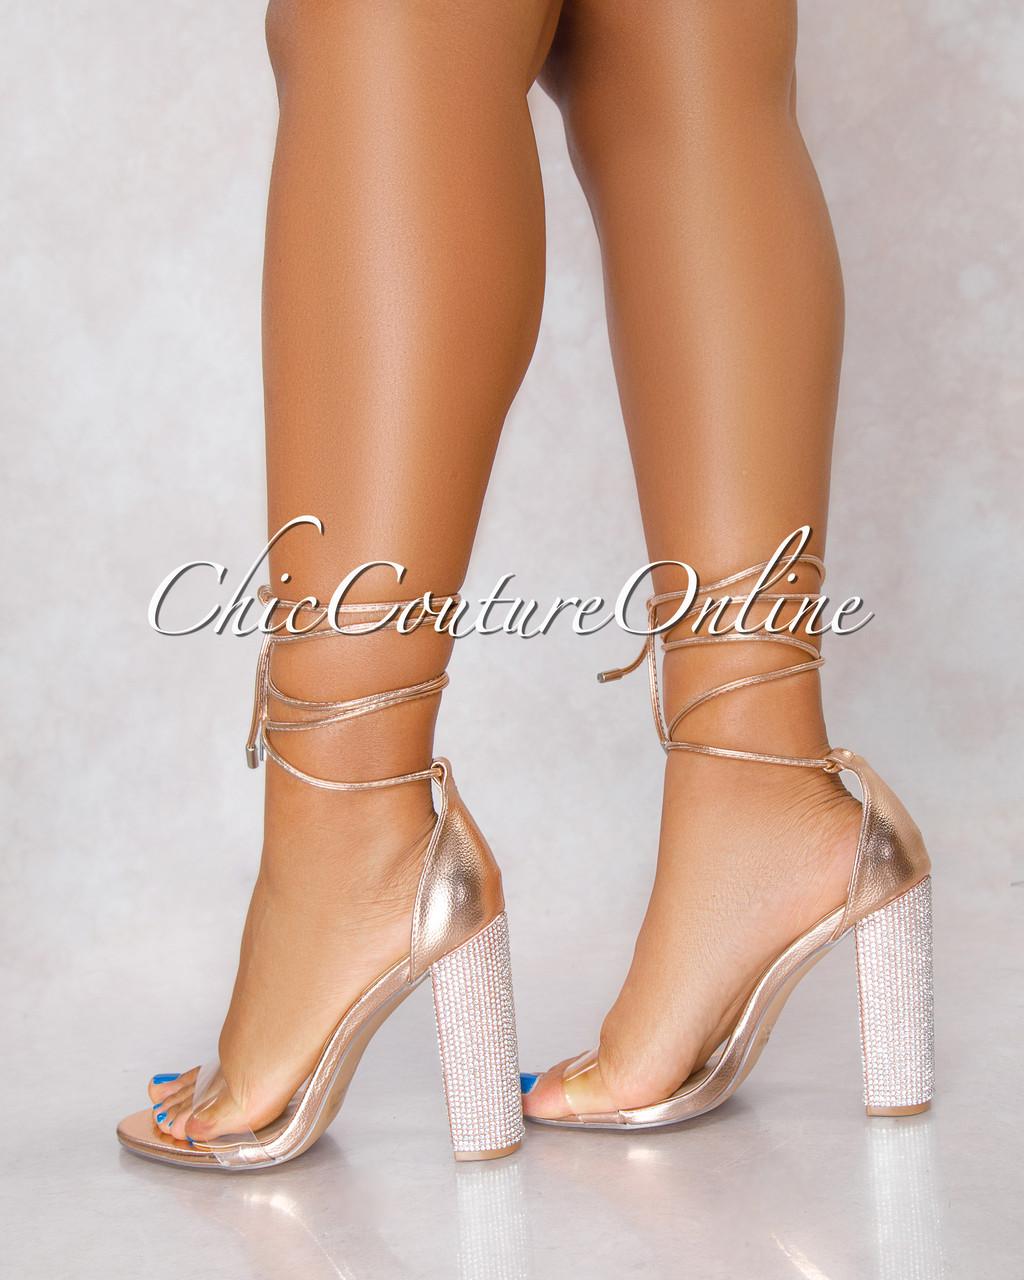 f689b4fcb24 ... Clear Strap Rhinestones Heel Lace Up Sandals. Price   50.00. Image 1